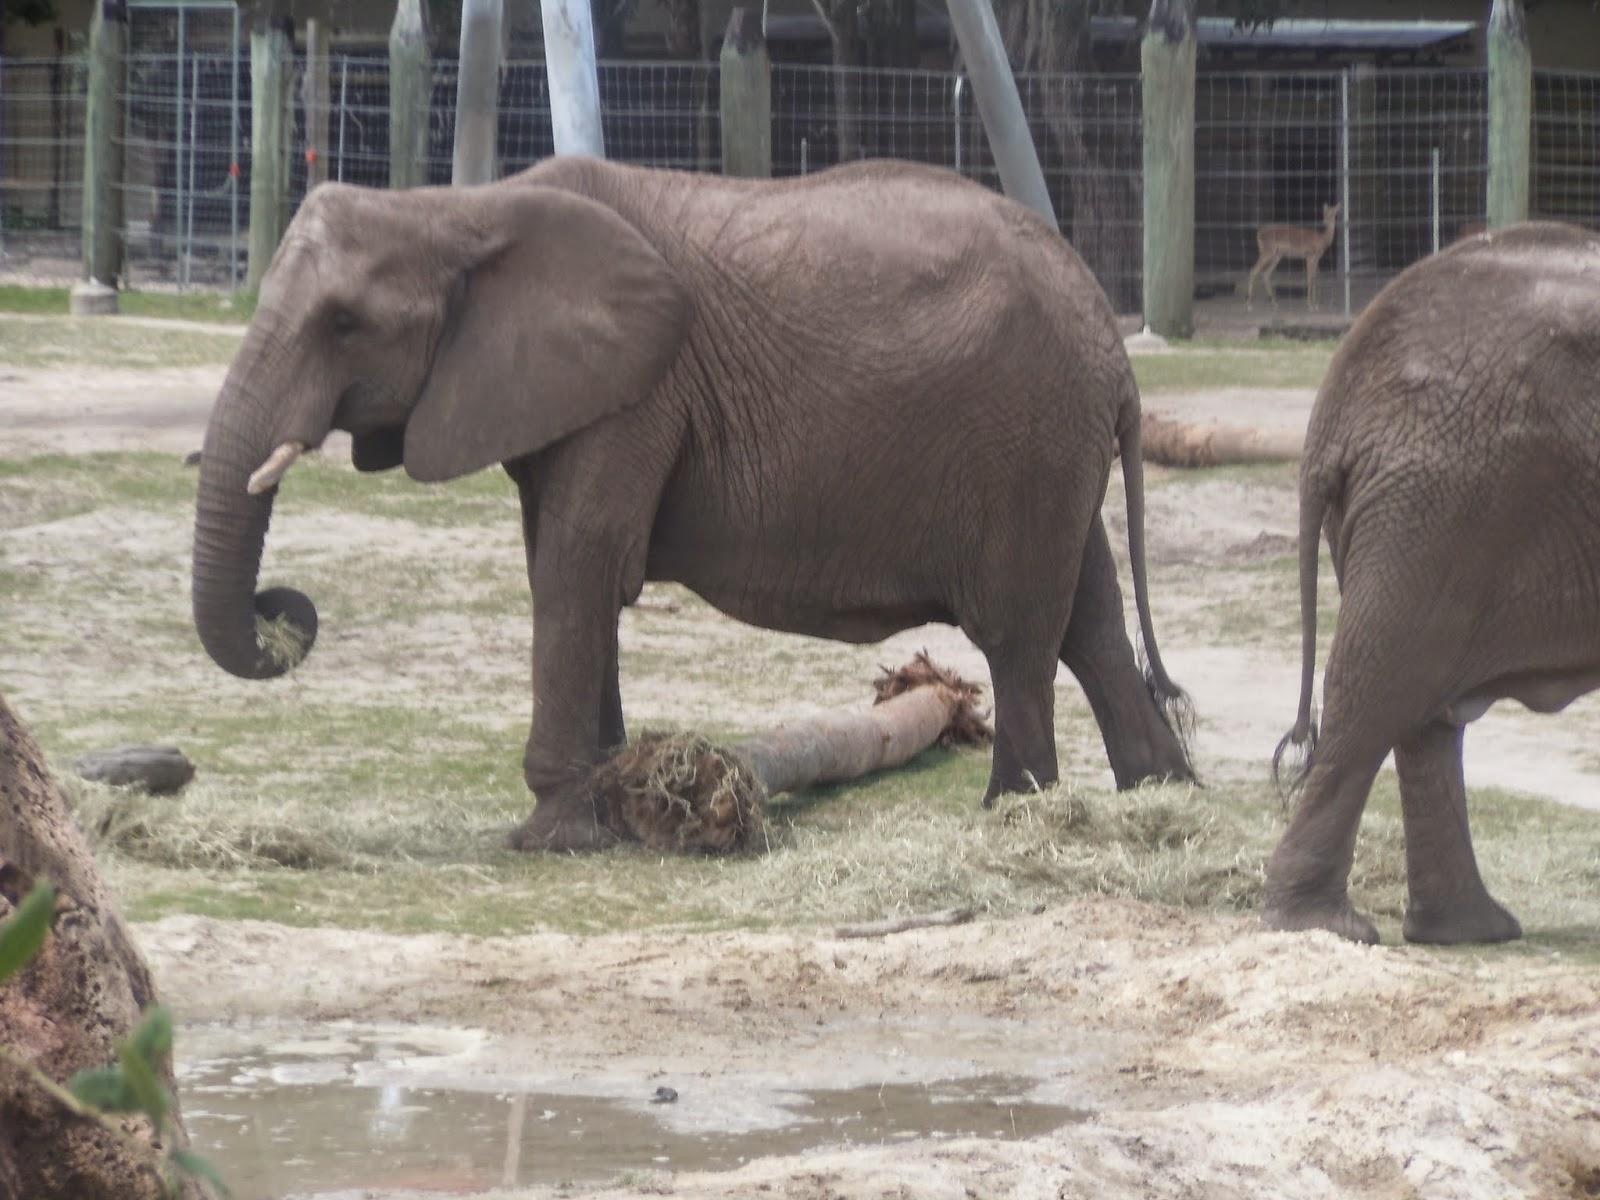 zoo animals activities for kids a is for adventures of homeschooling